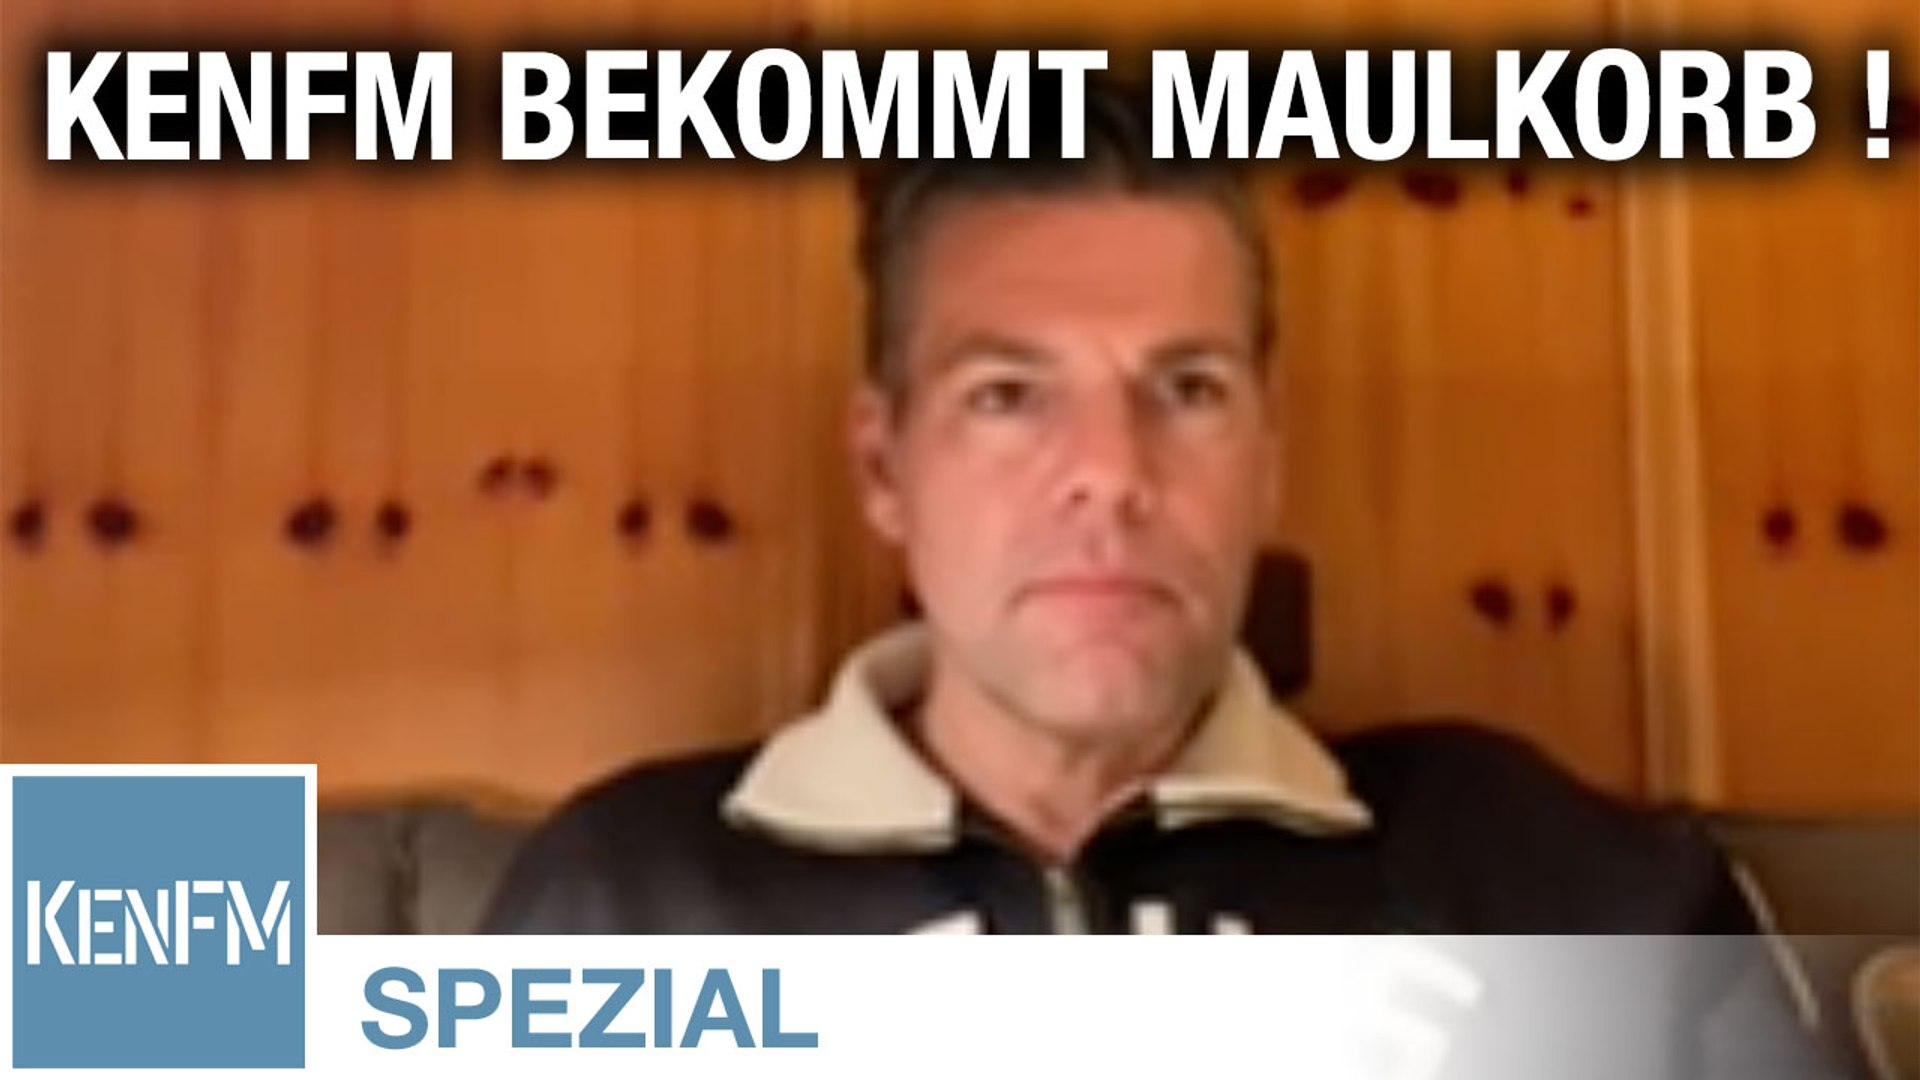 Digitale Diktatur: KenFM bekommt Maulkorb verpasst!